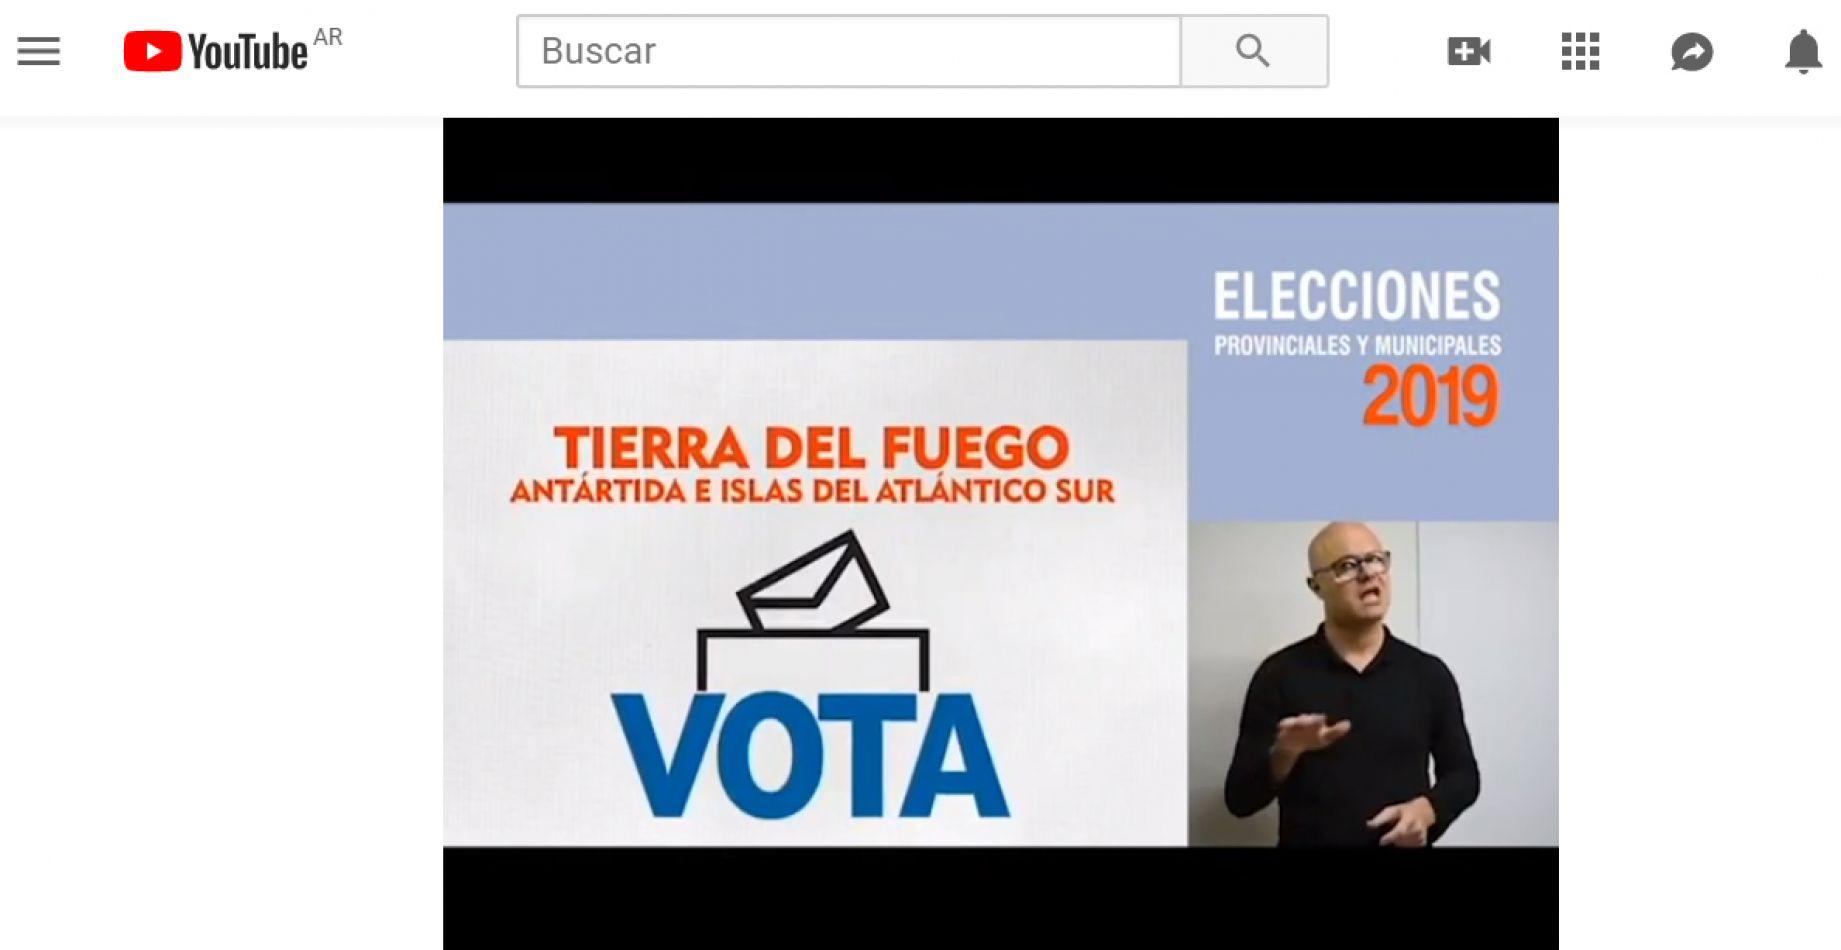 Los spots con guías para votantes hipoacúsicos, están publicados en You Tube.